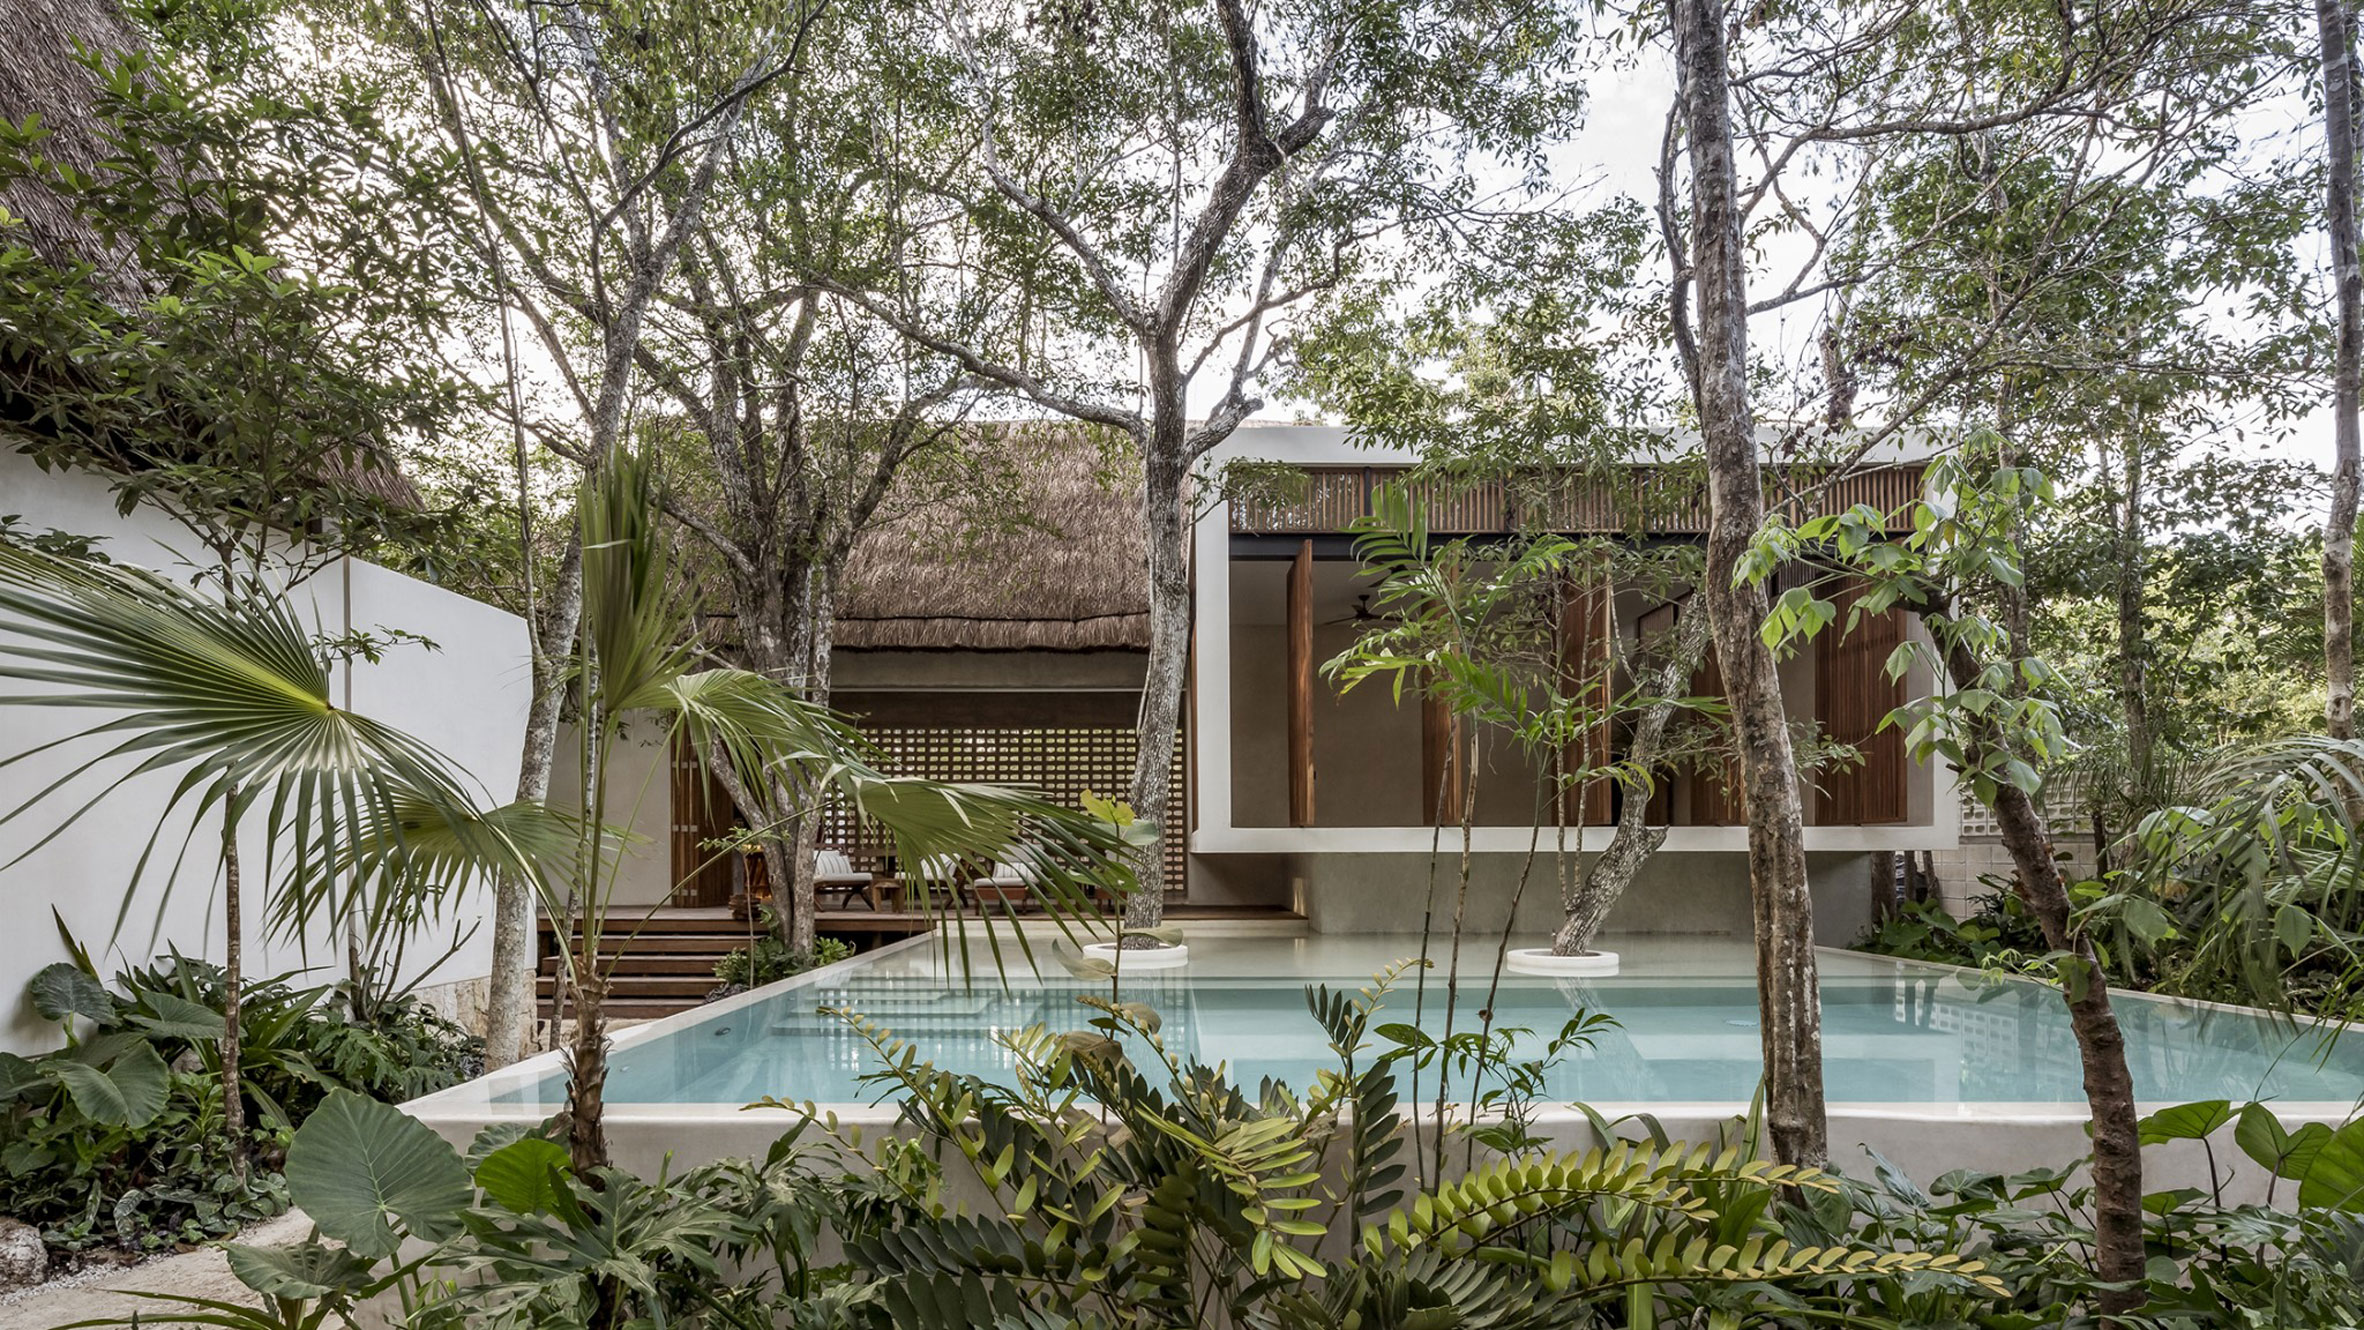 Jungle Keva hotel, Tulum, Mexico, by Jaquestudio